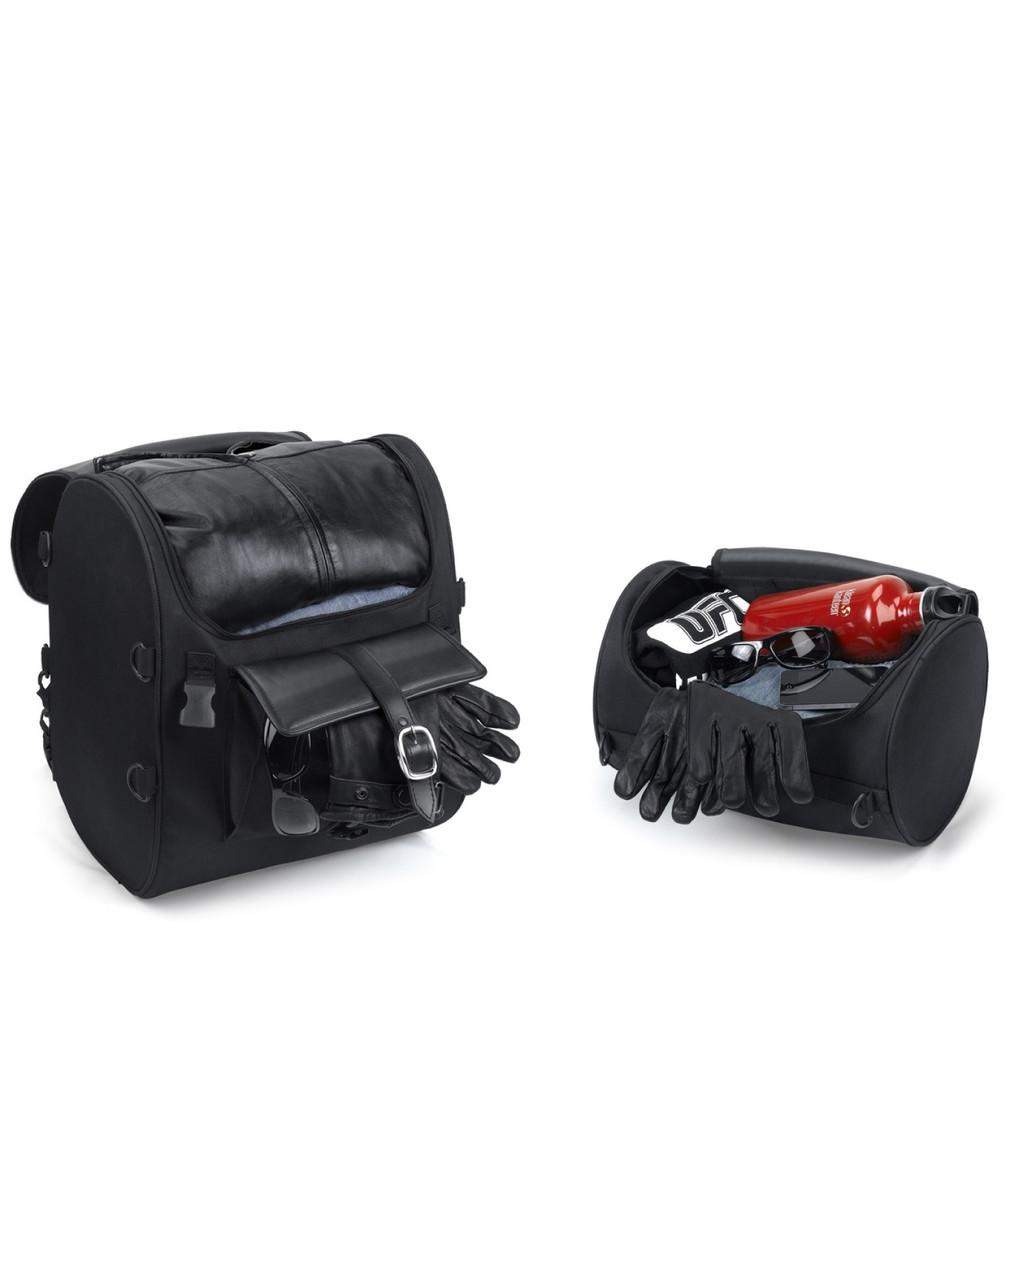 Suzuki Economy Line Motorcycle Sissy Bar Bag Storage View